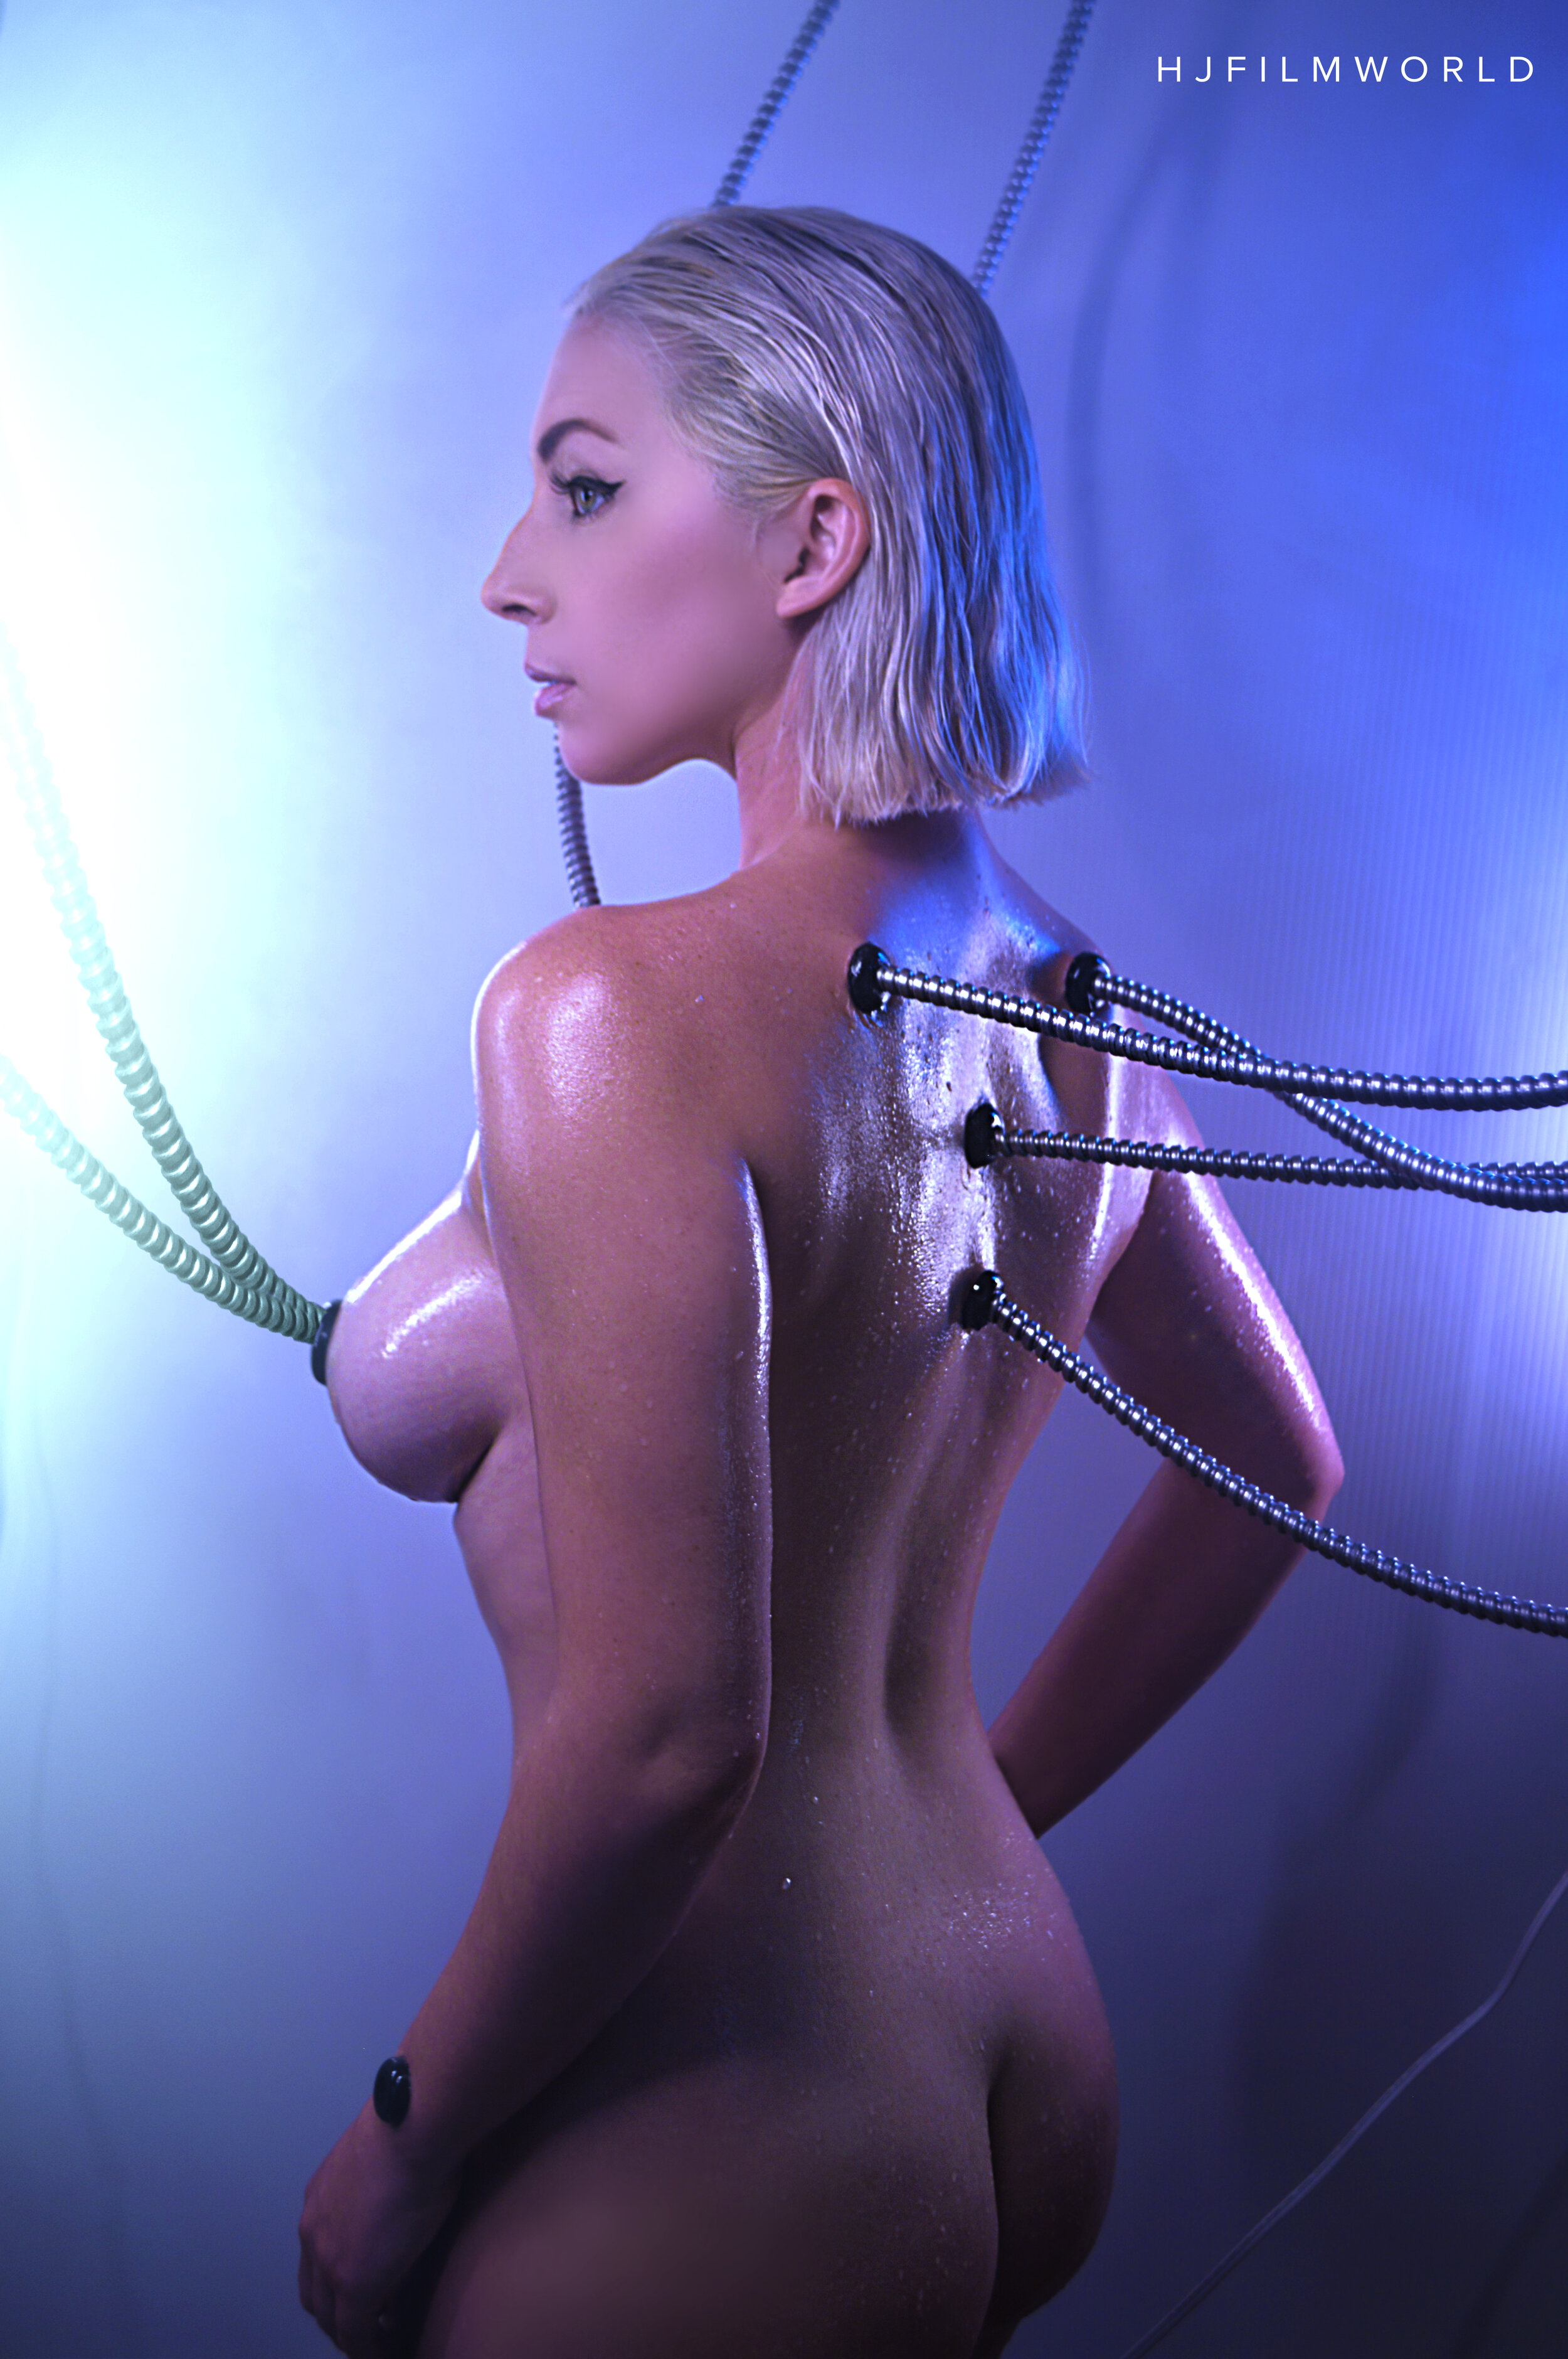 Model: Hanna Lee